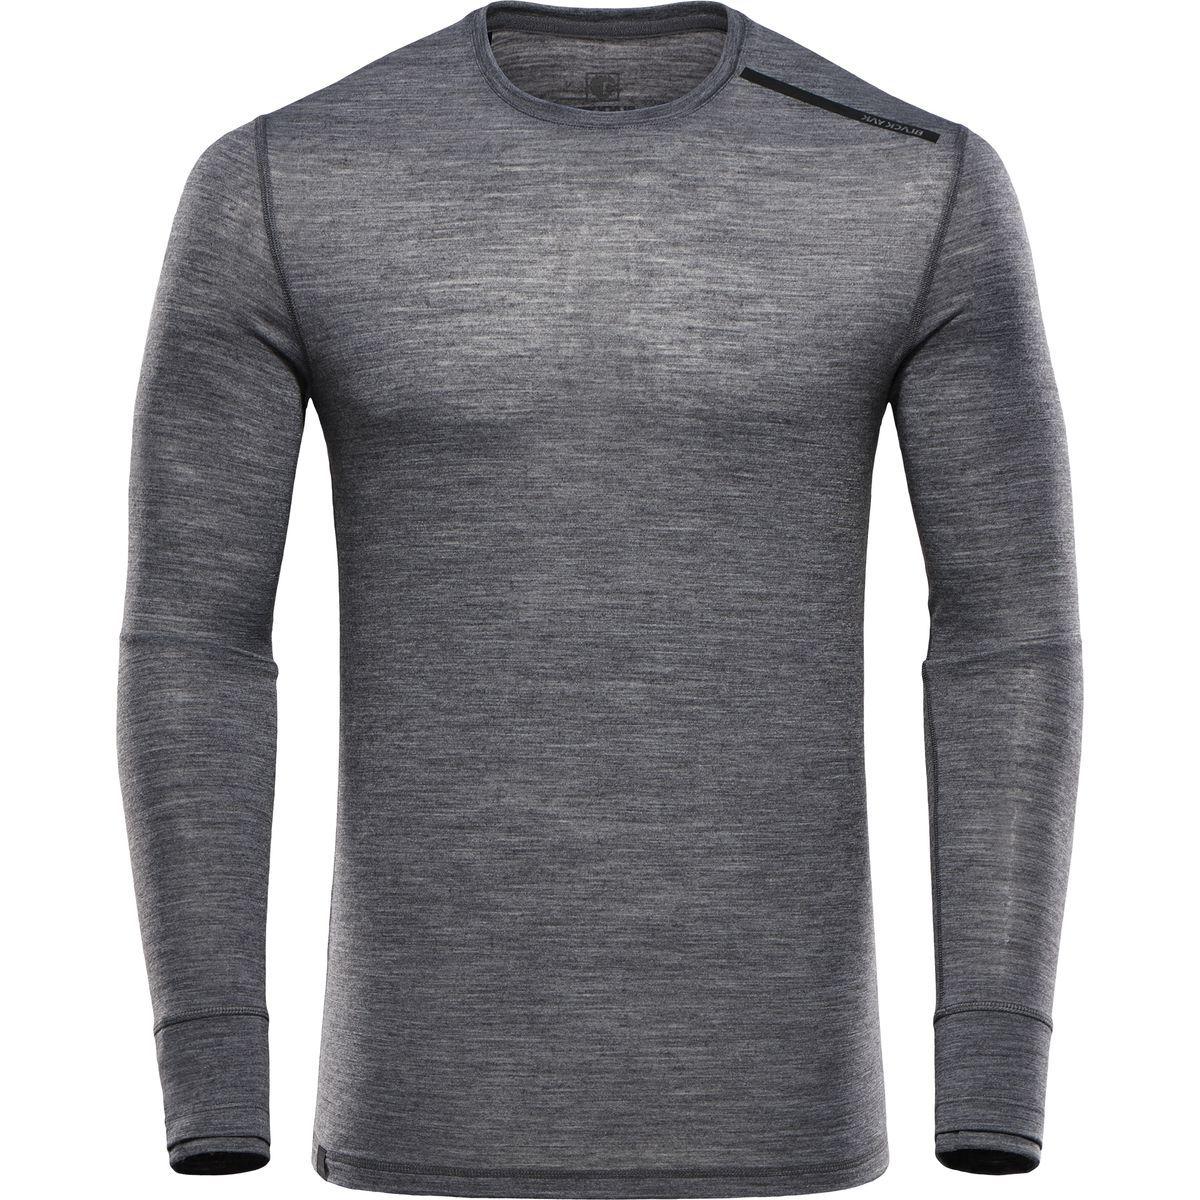 BLACKYAK Abigar Shirt - Men's